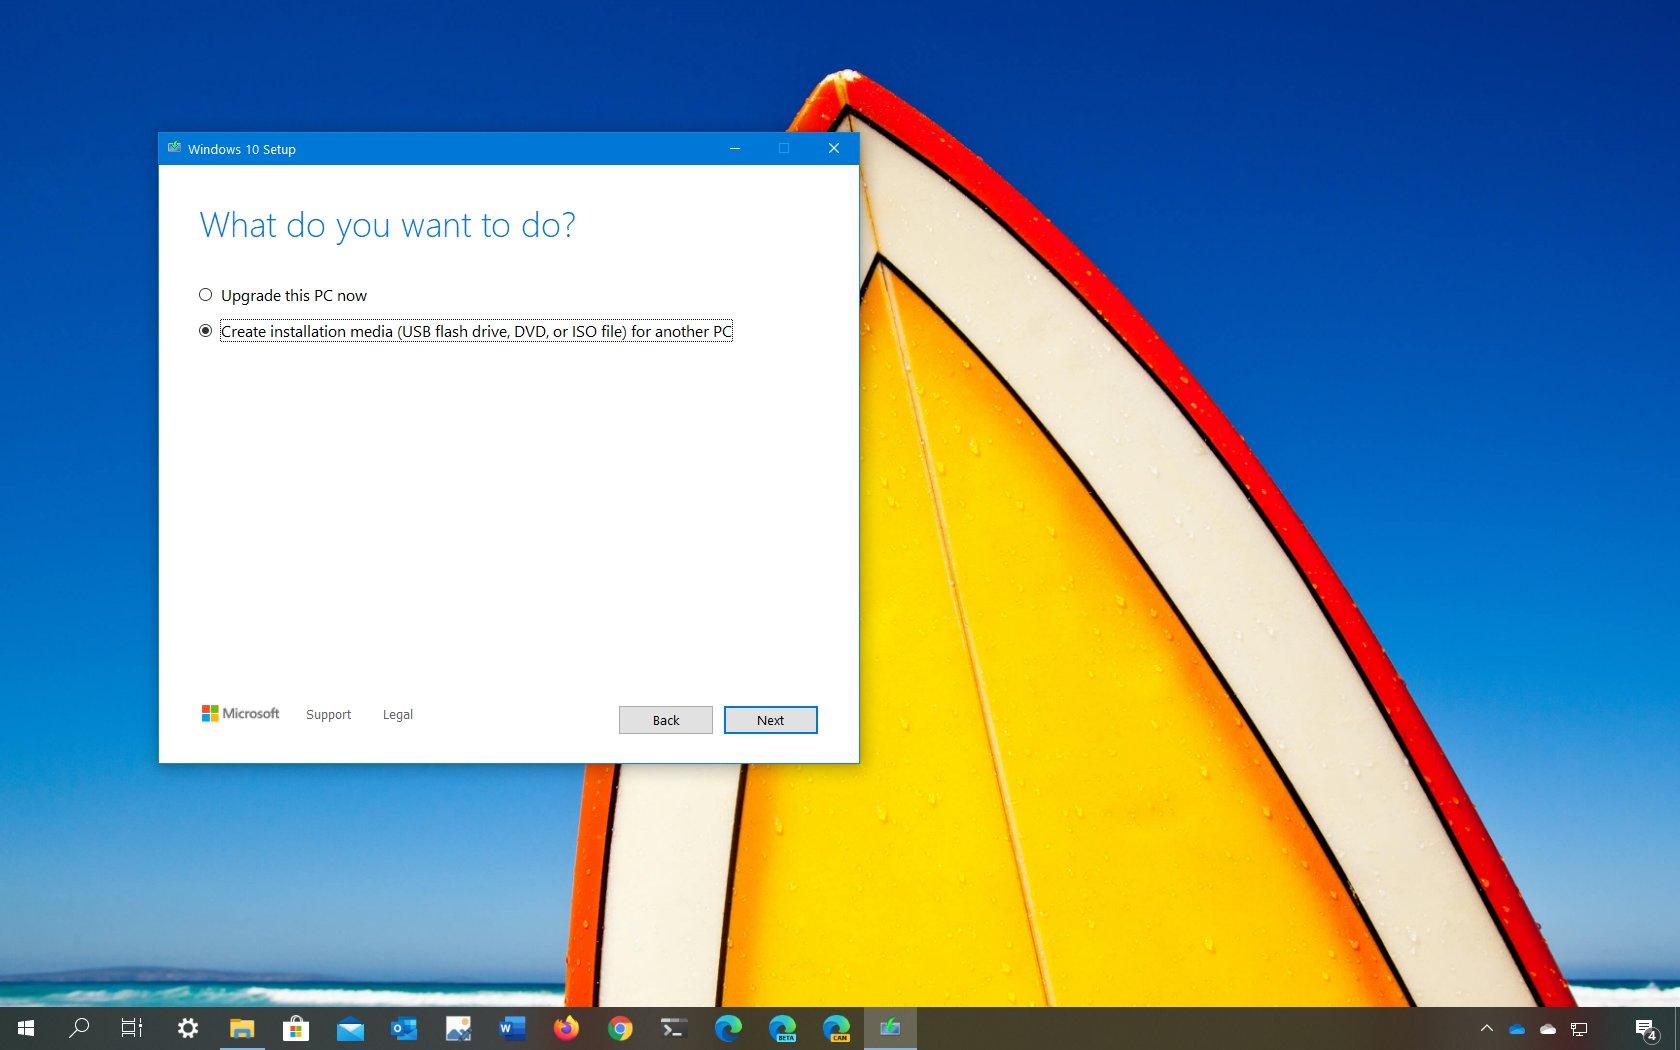 Windows 10 version 2004 clean install